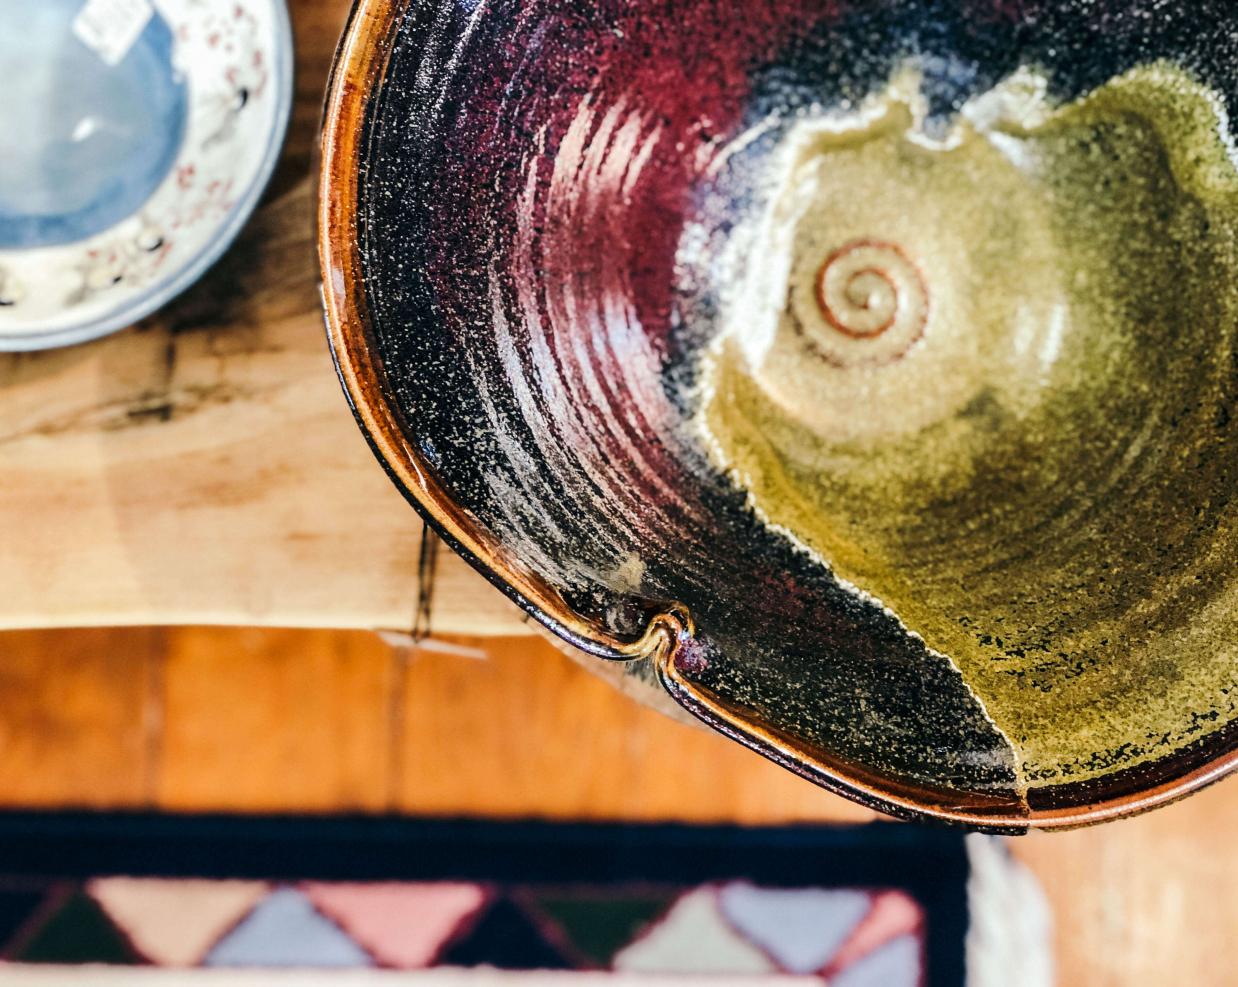 potterywaxhaw